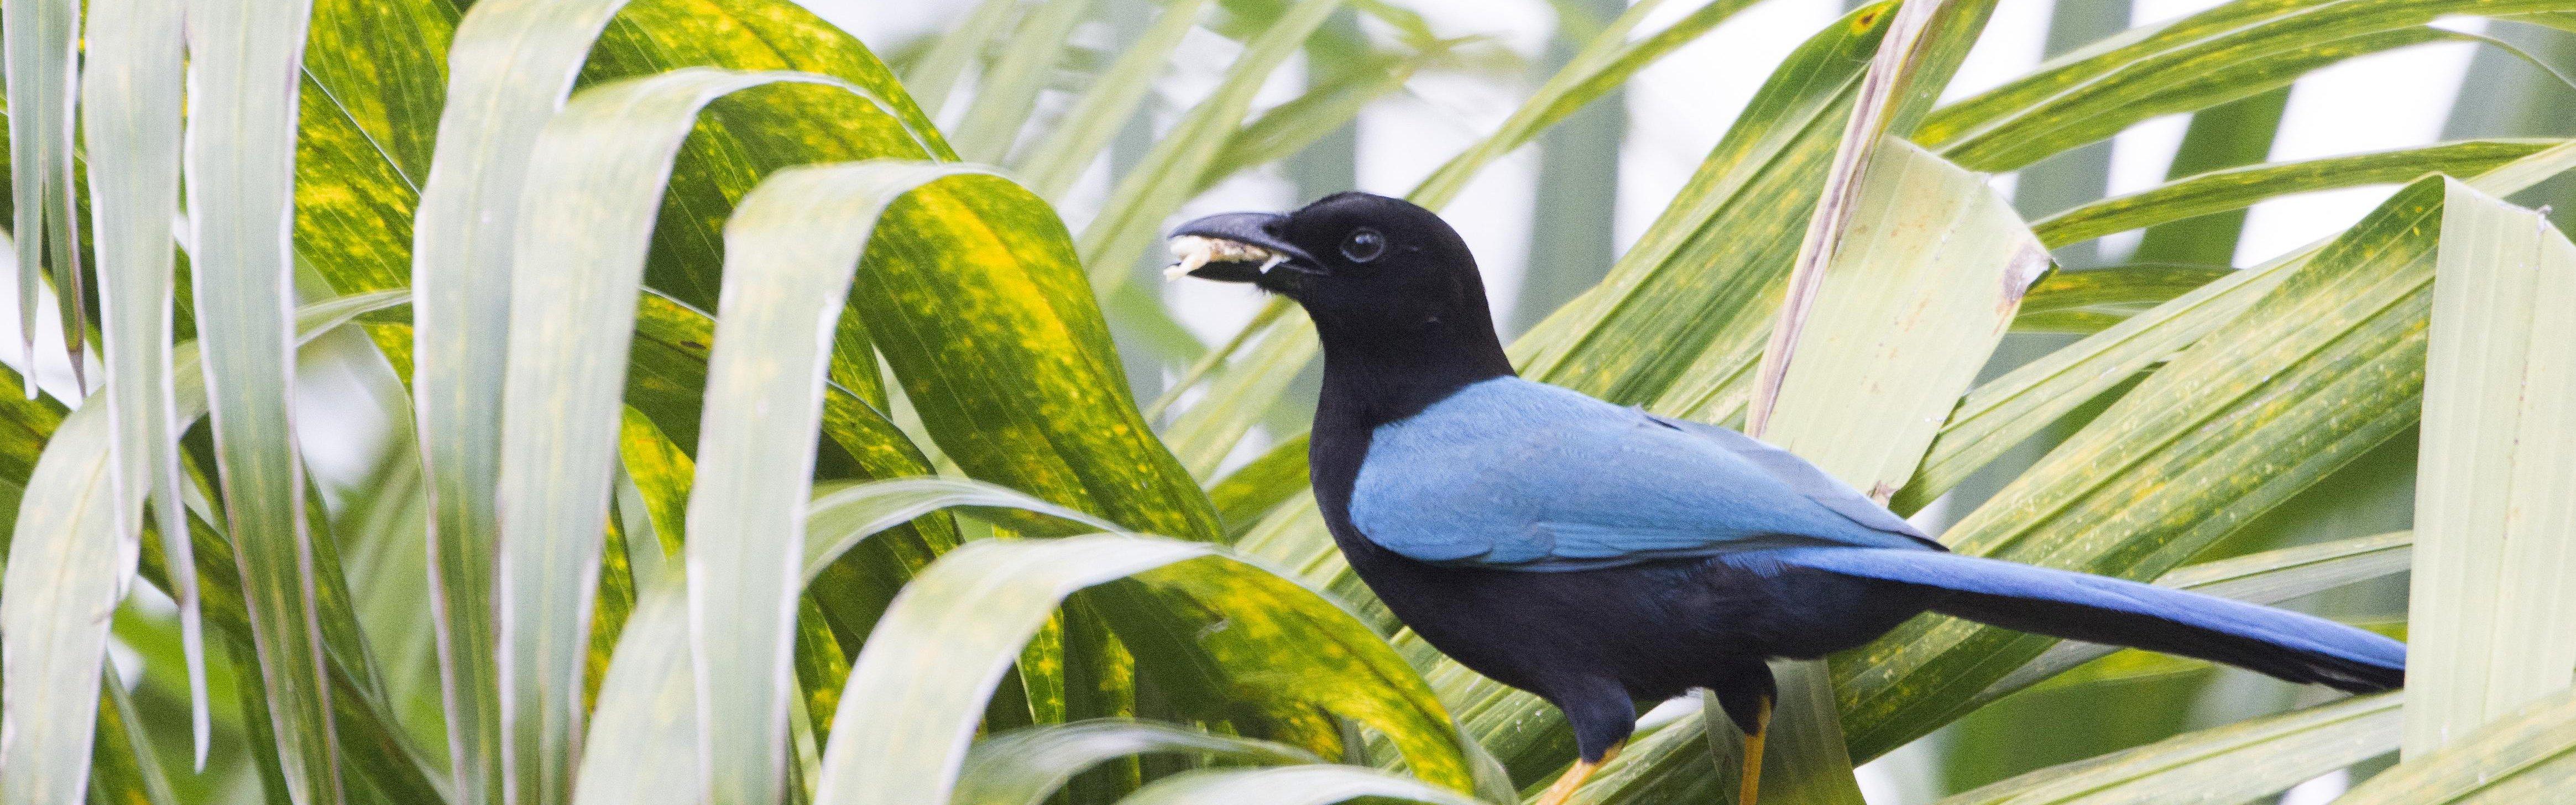 Vogelreis Mexico - Yucatan Jay - Jan Mulder